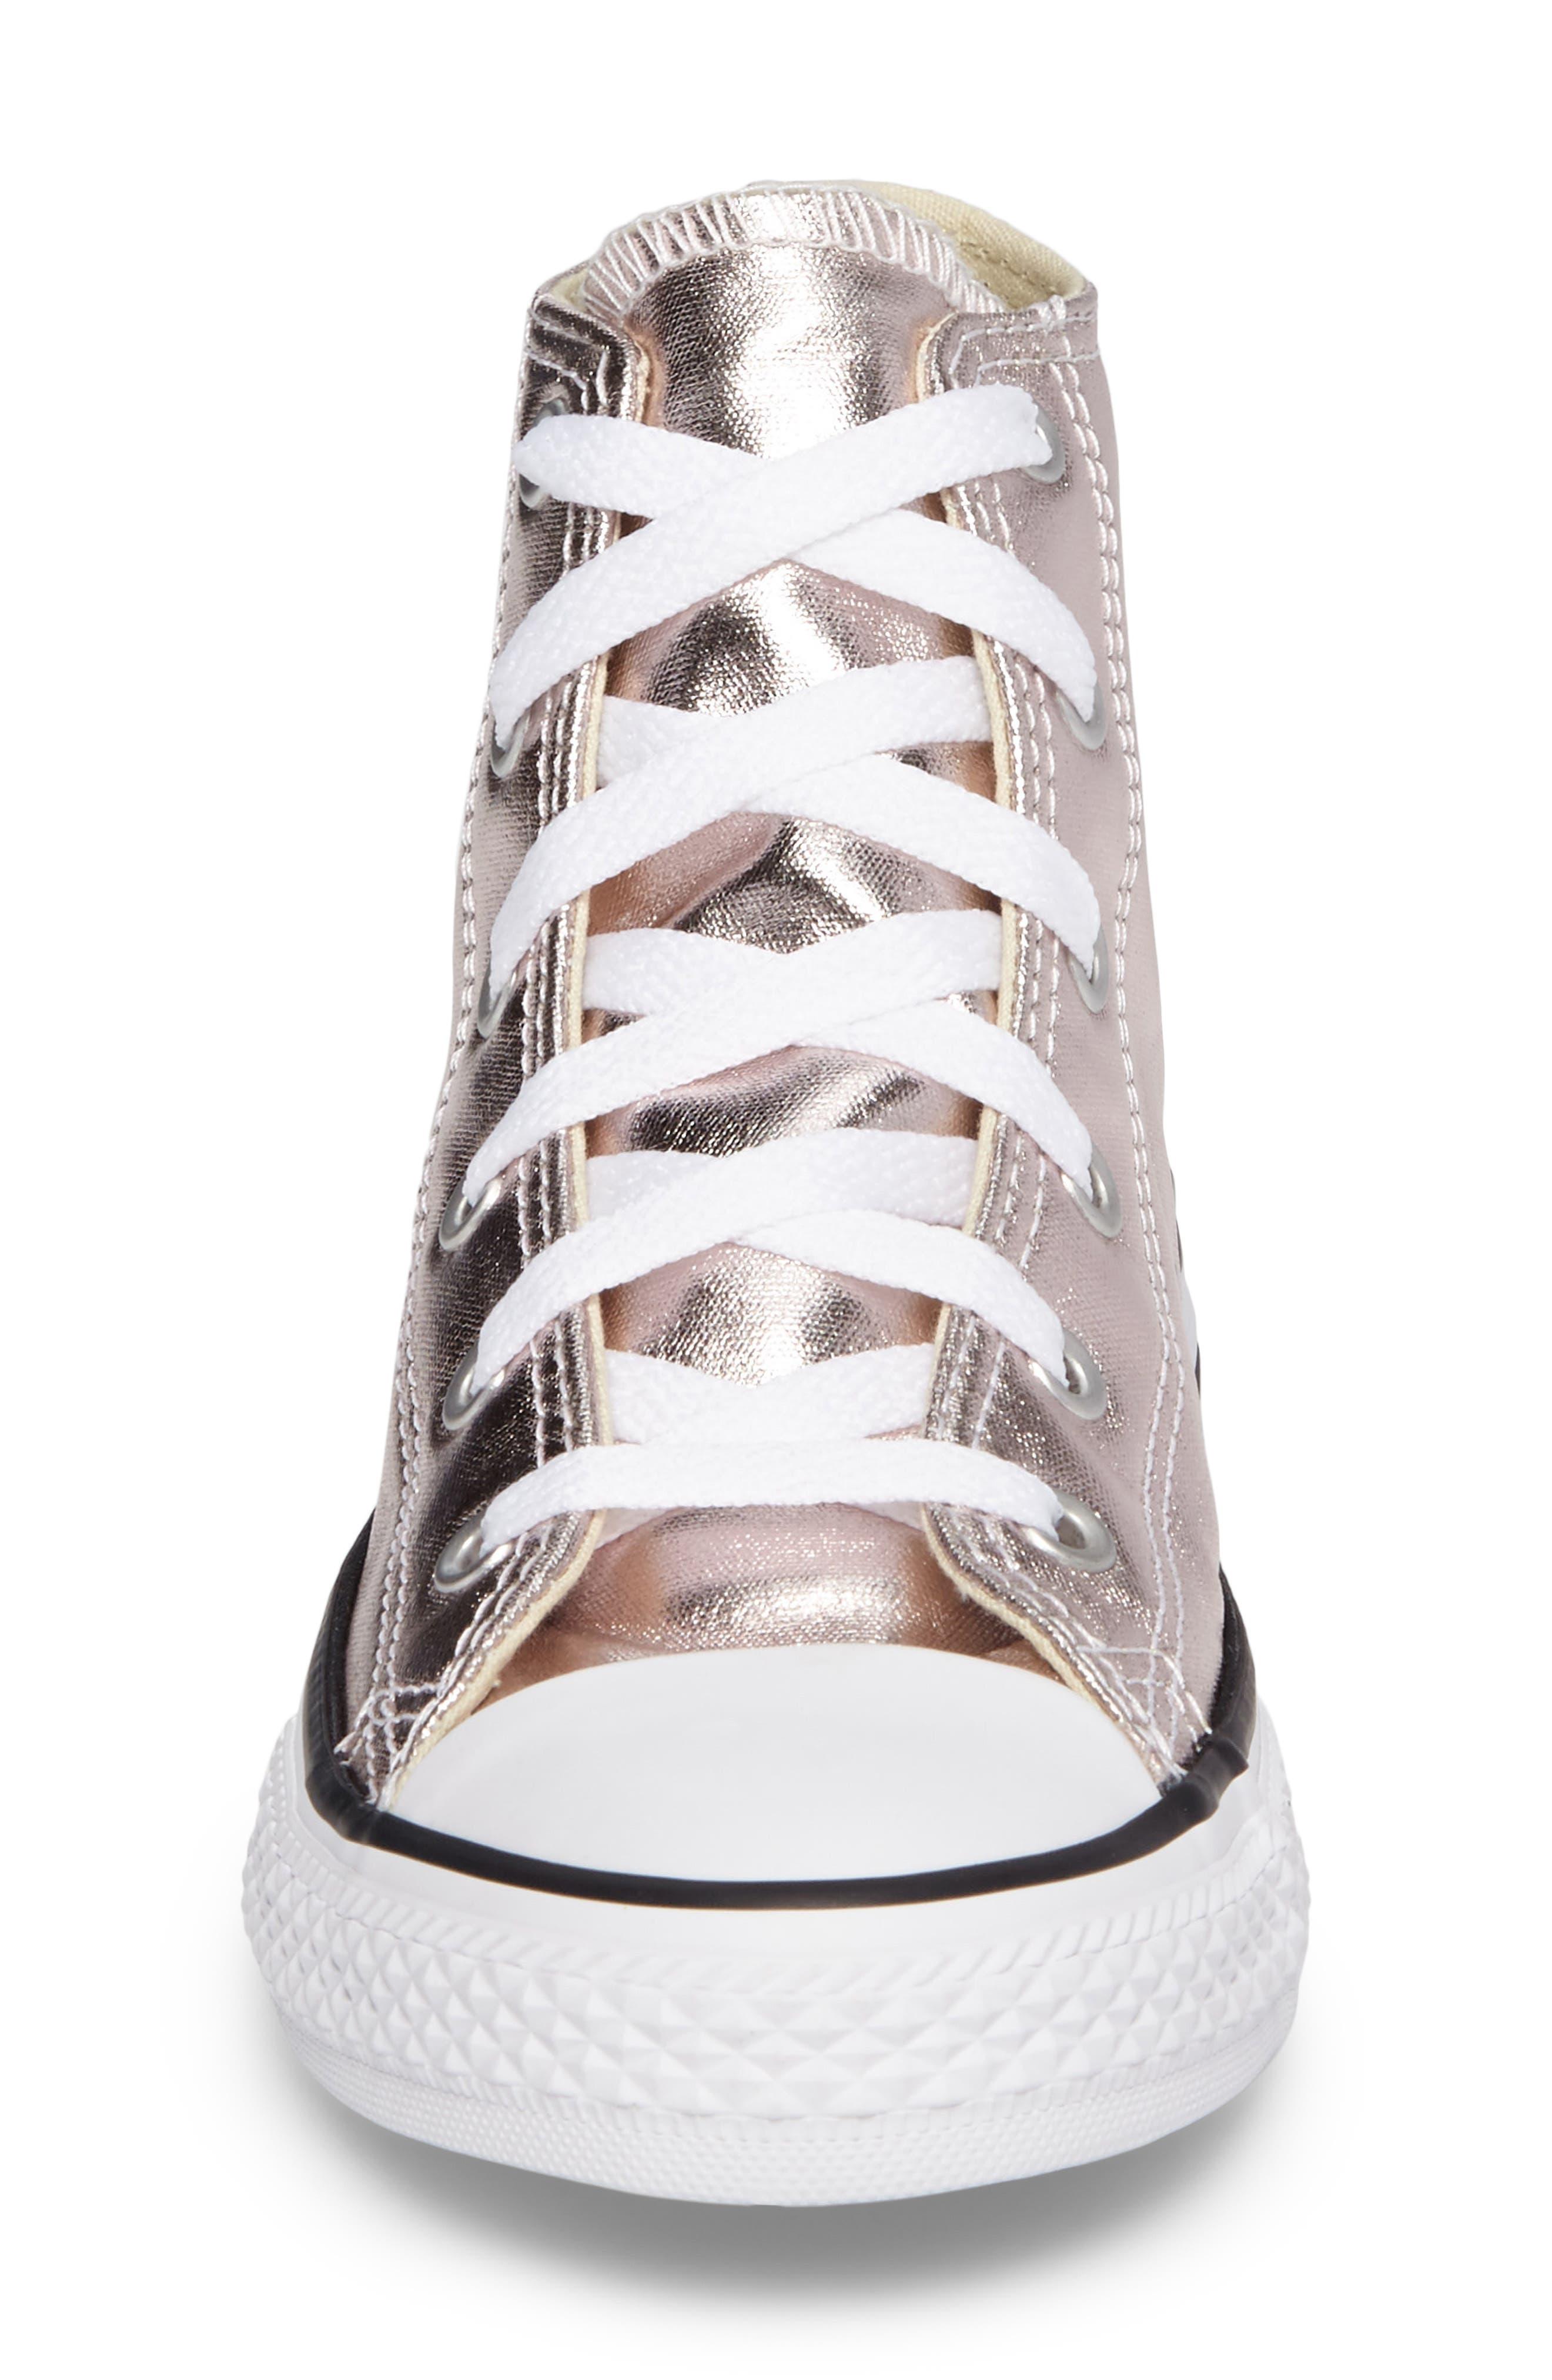 Alternate Image 4  - Converse Chuck Taylor® All Star® Seasonal Metallic High Top Sneaker (Toddler & Little Kid)